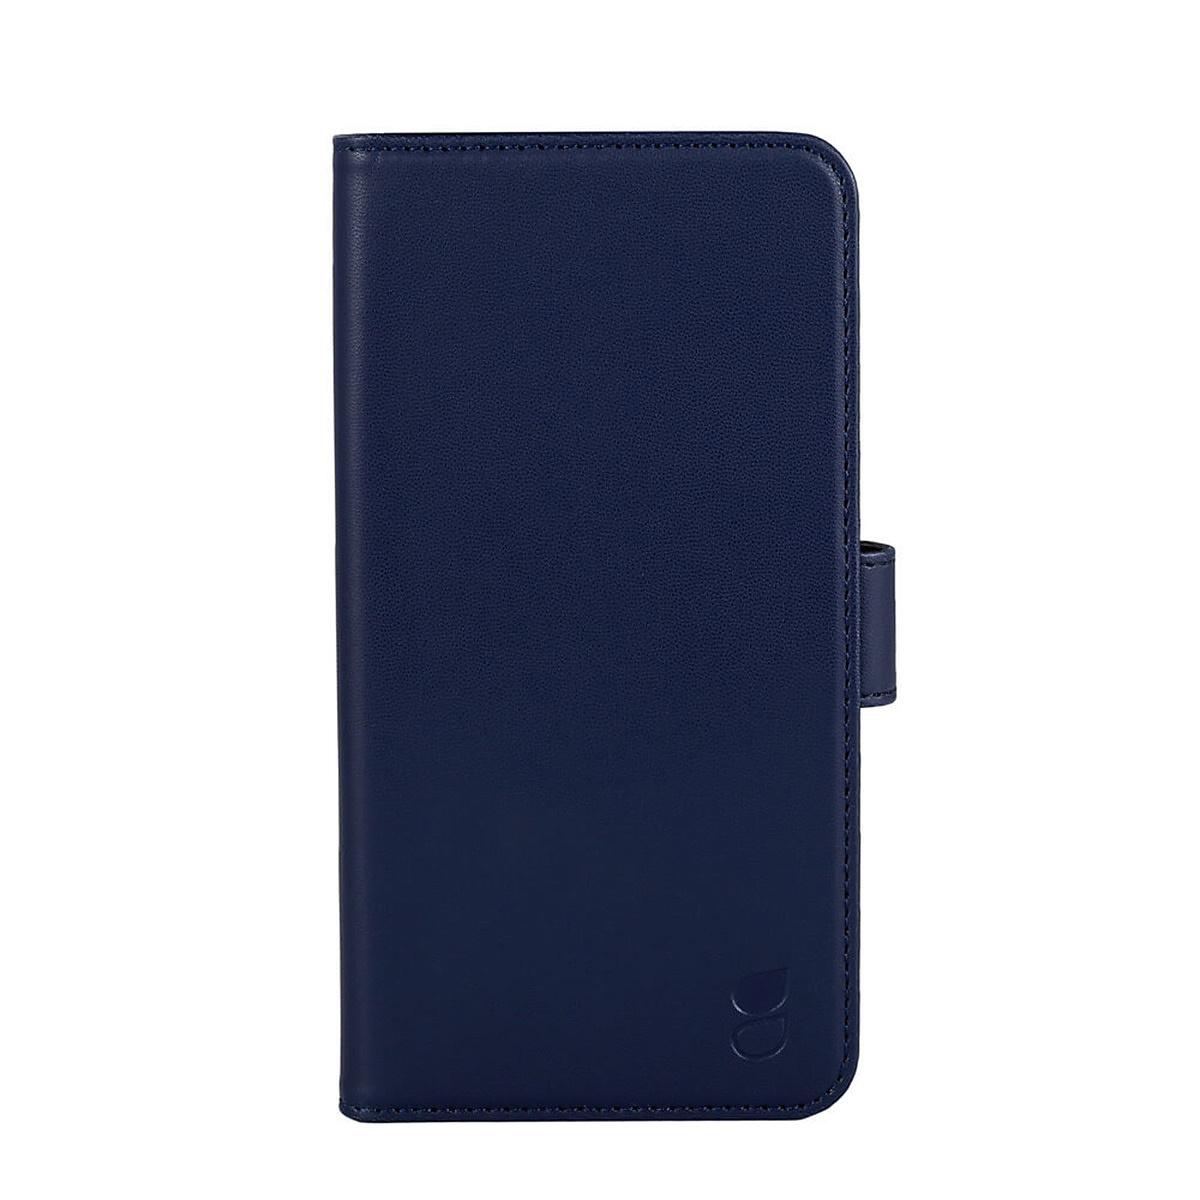 Gear plånboksväska, Limited Edition, iPhone 11 Pro Max, blå